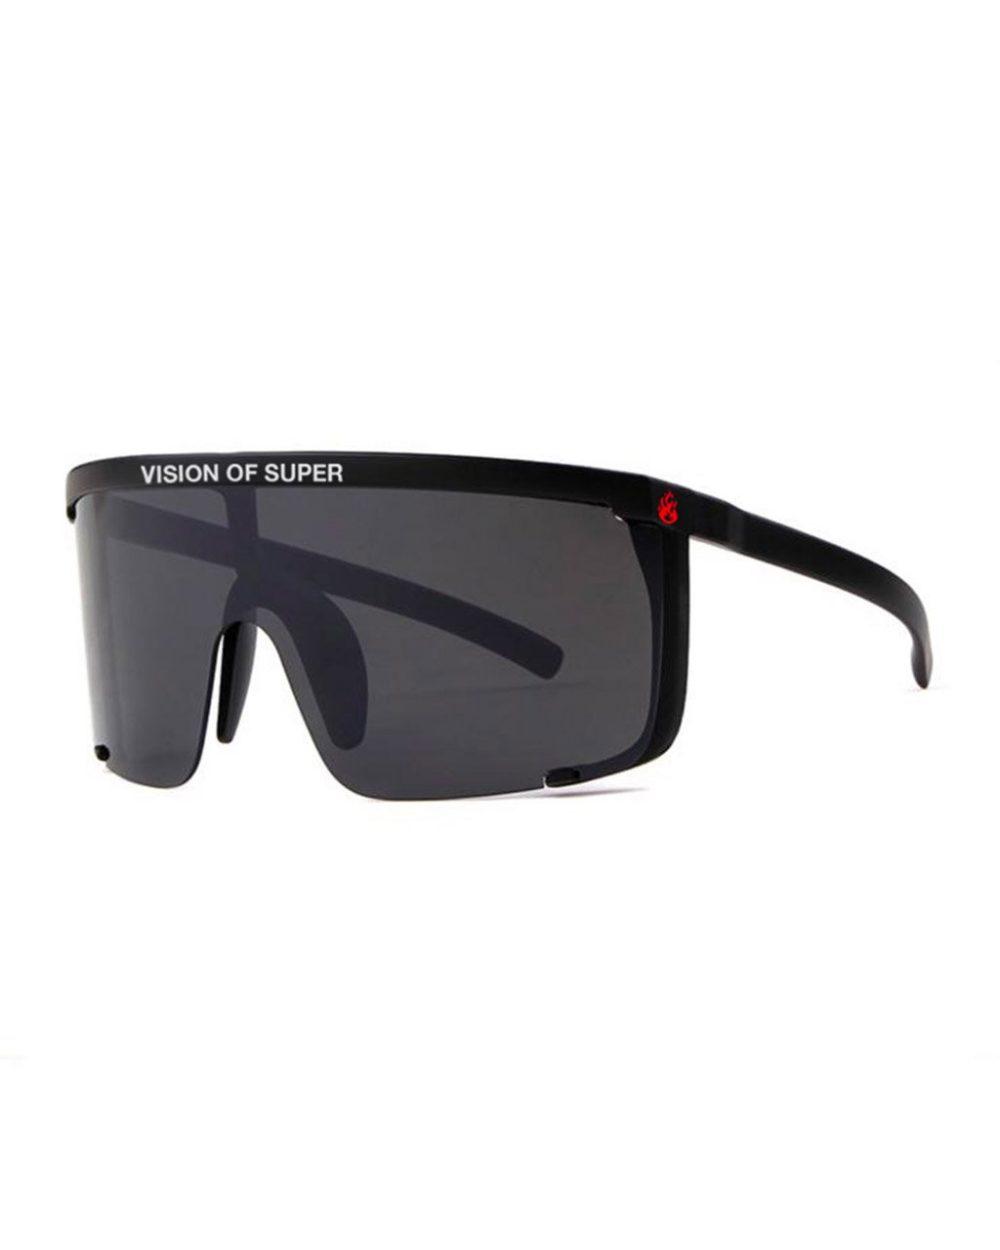 vision-of-super-flames-black-sunglasses-occhiali-sixstreet-shop-bolzano